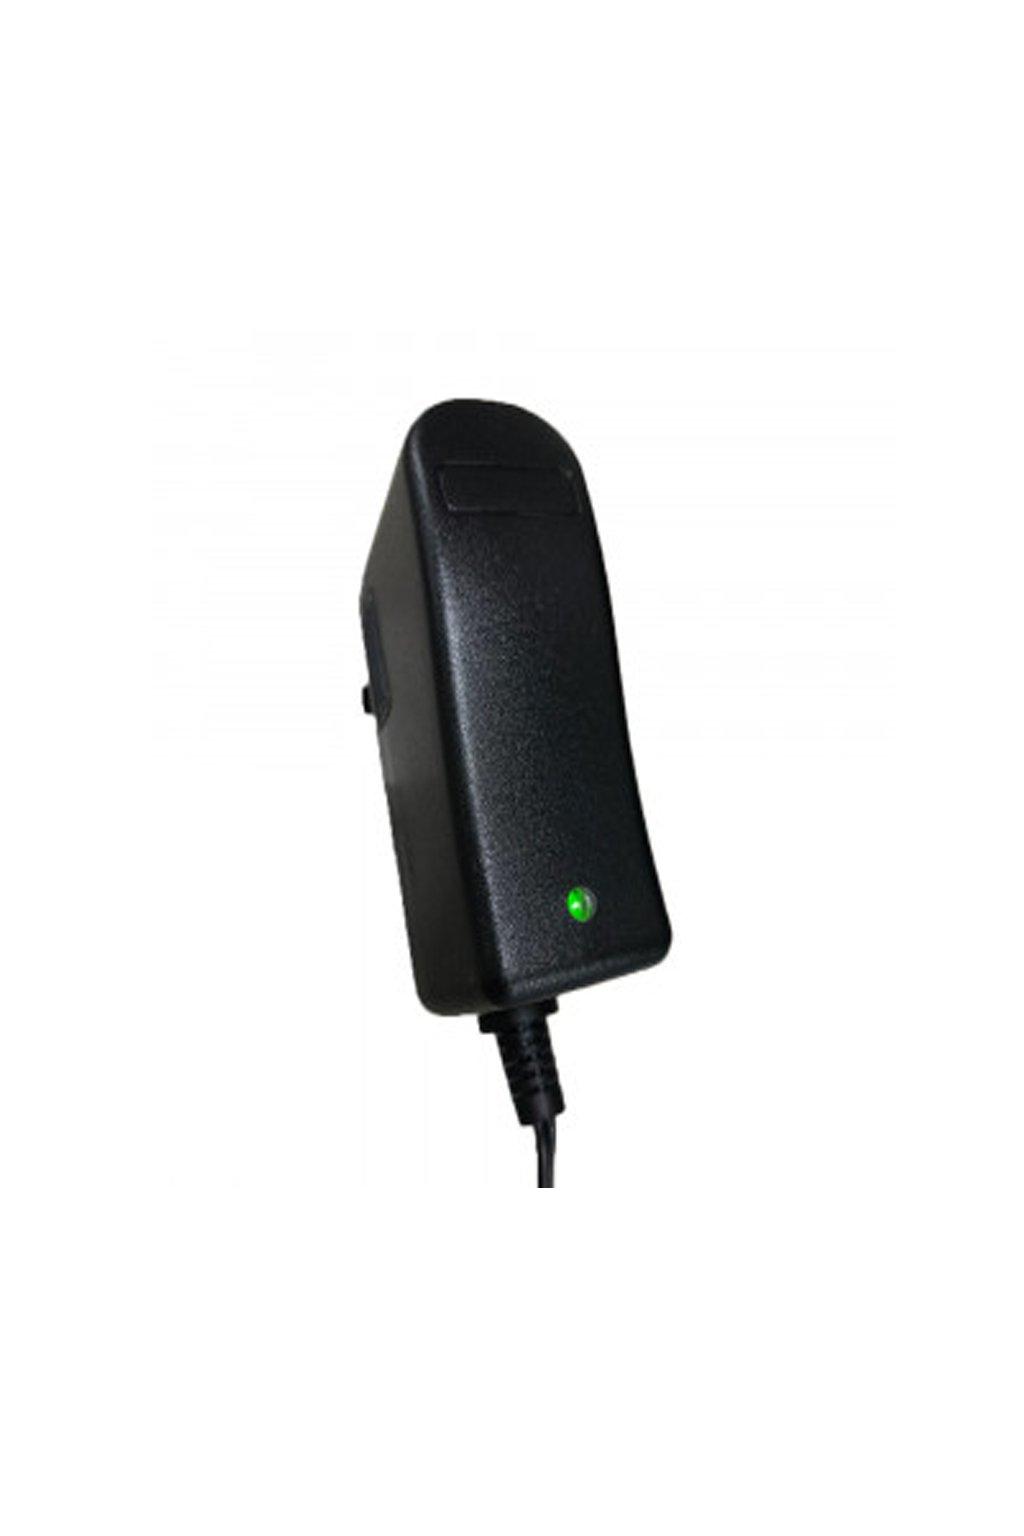 Adaptér s LED indikatorem